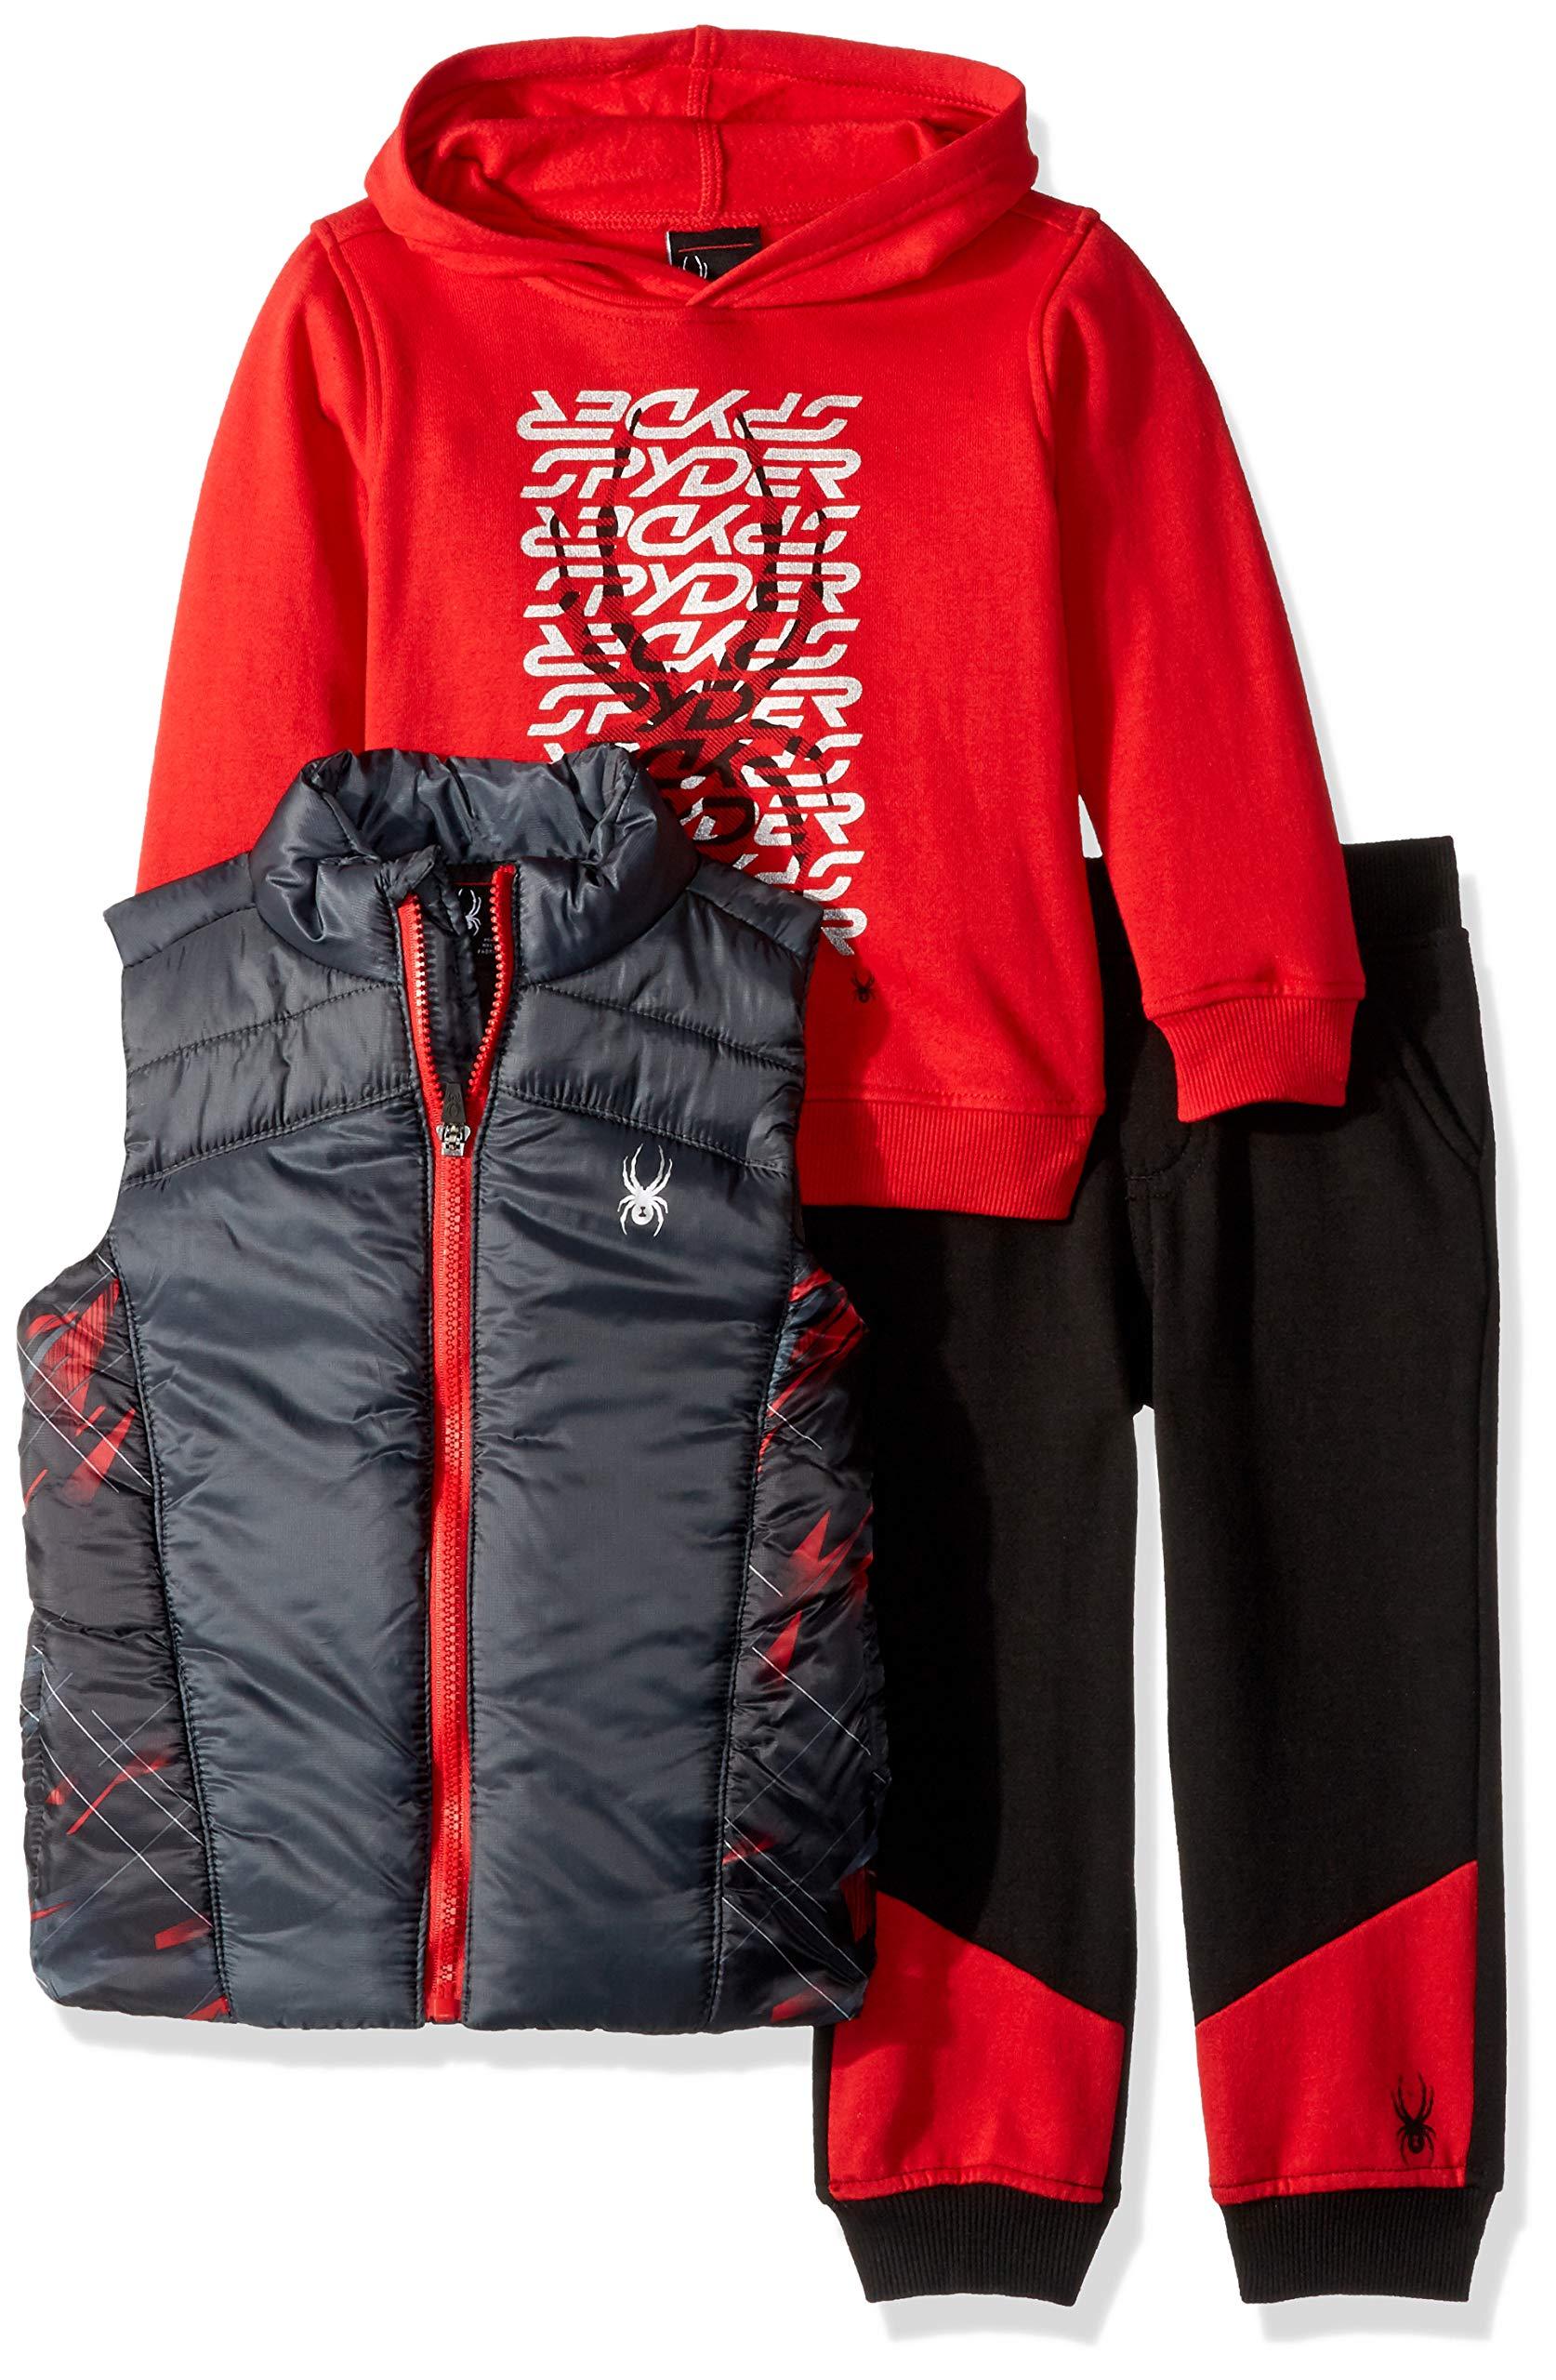 Spyder Boys' Toddler 3 Pieces Vest Set, Gray/red, 2T